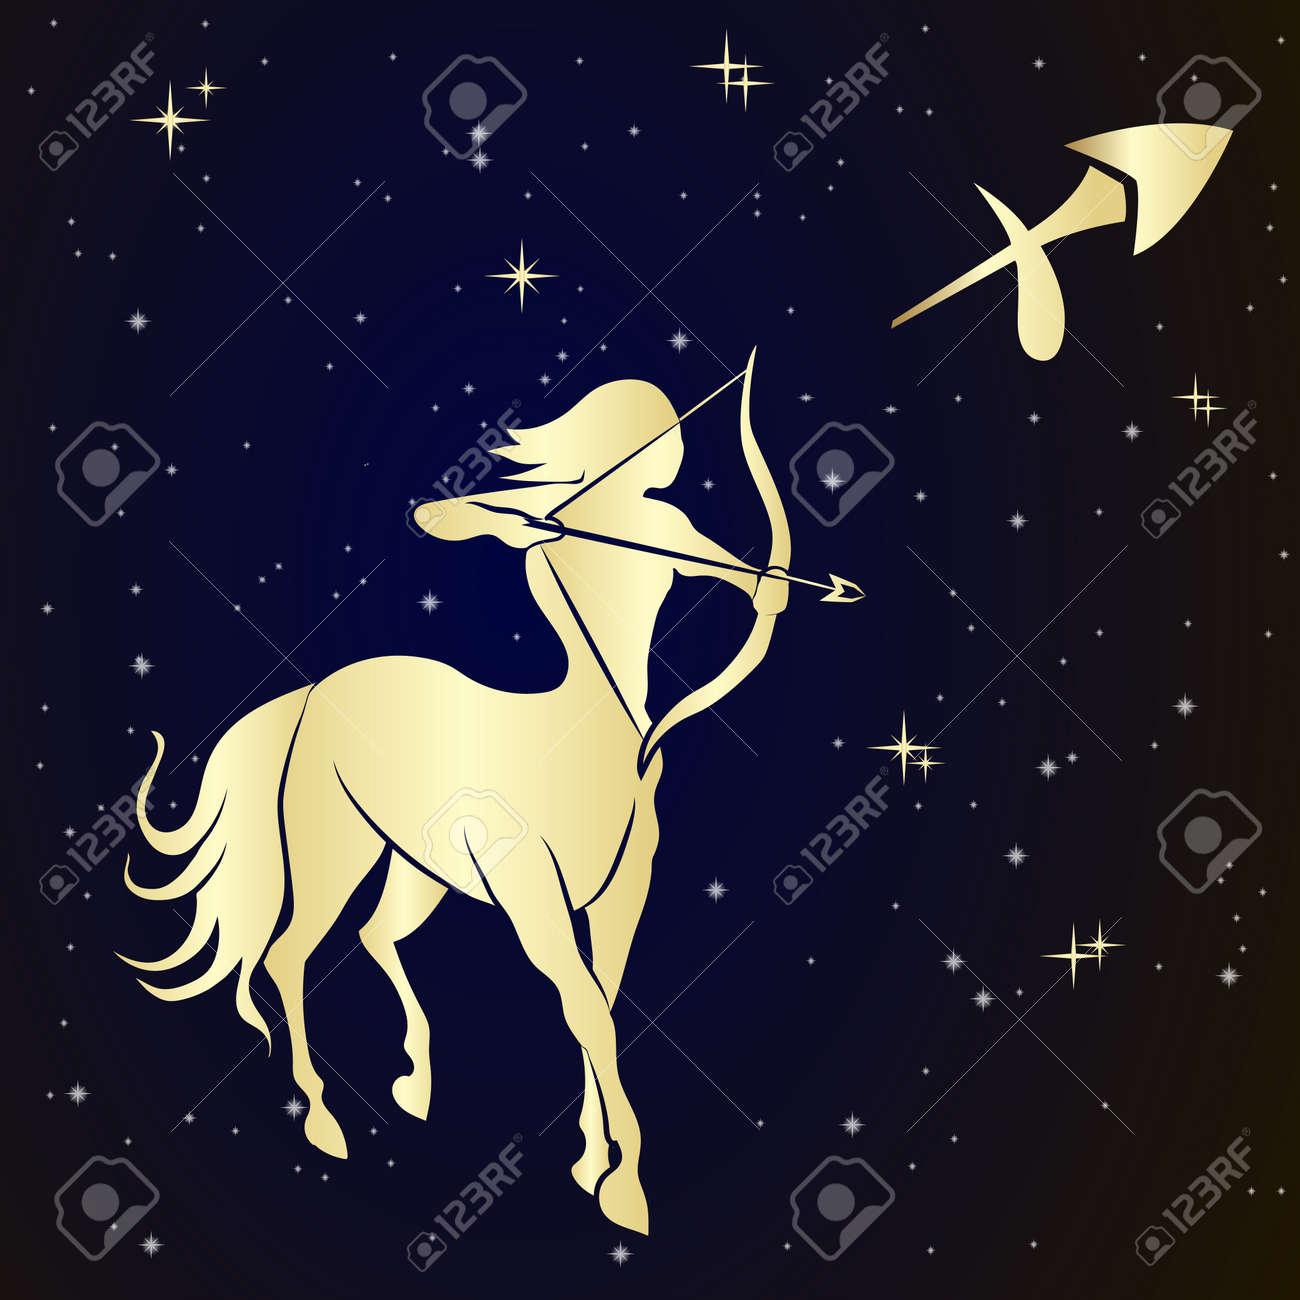 Sagittarius zodiac sign is the starry sky, vector Illustration. Contour icon. - 48498816